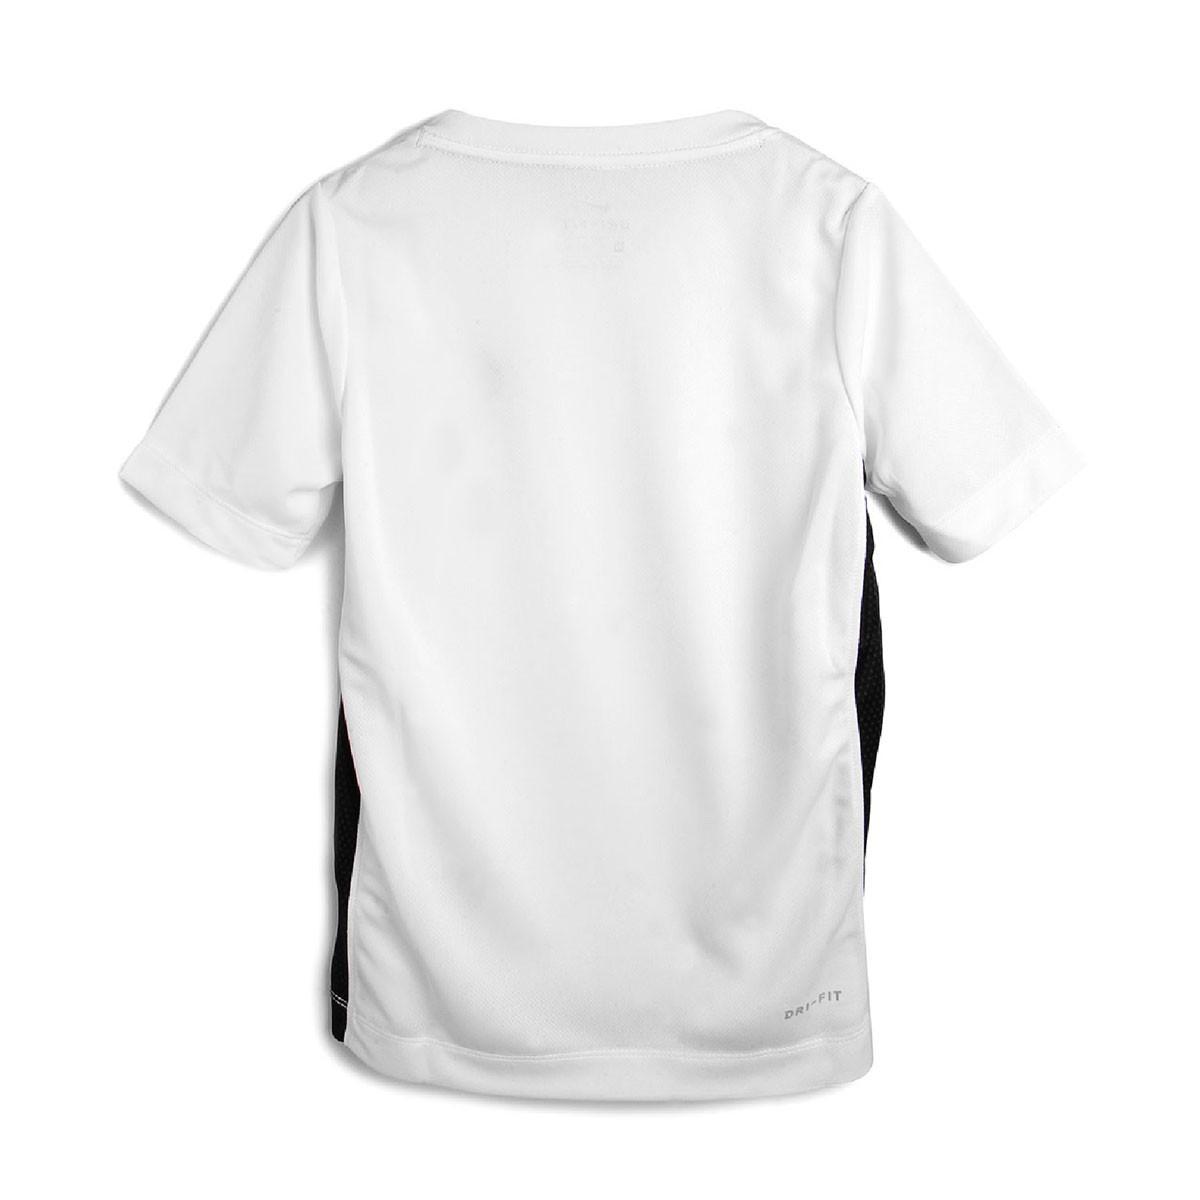 Camiseta Nike Dri-FIT Top SS Infantil Branco